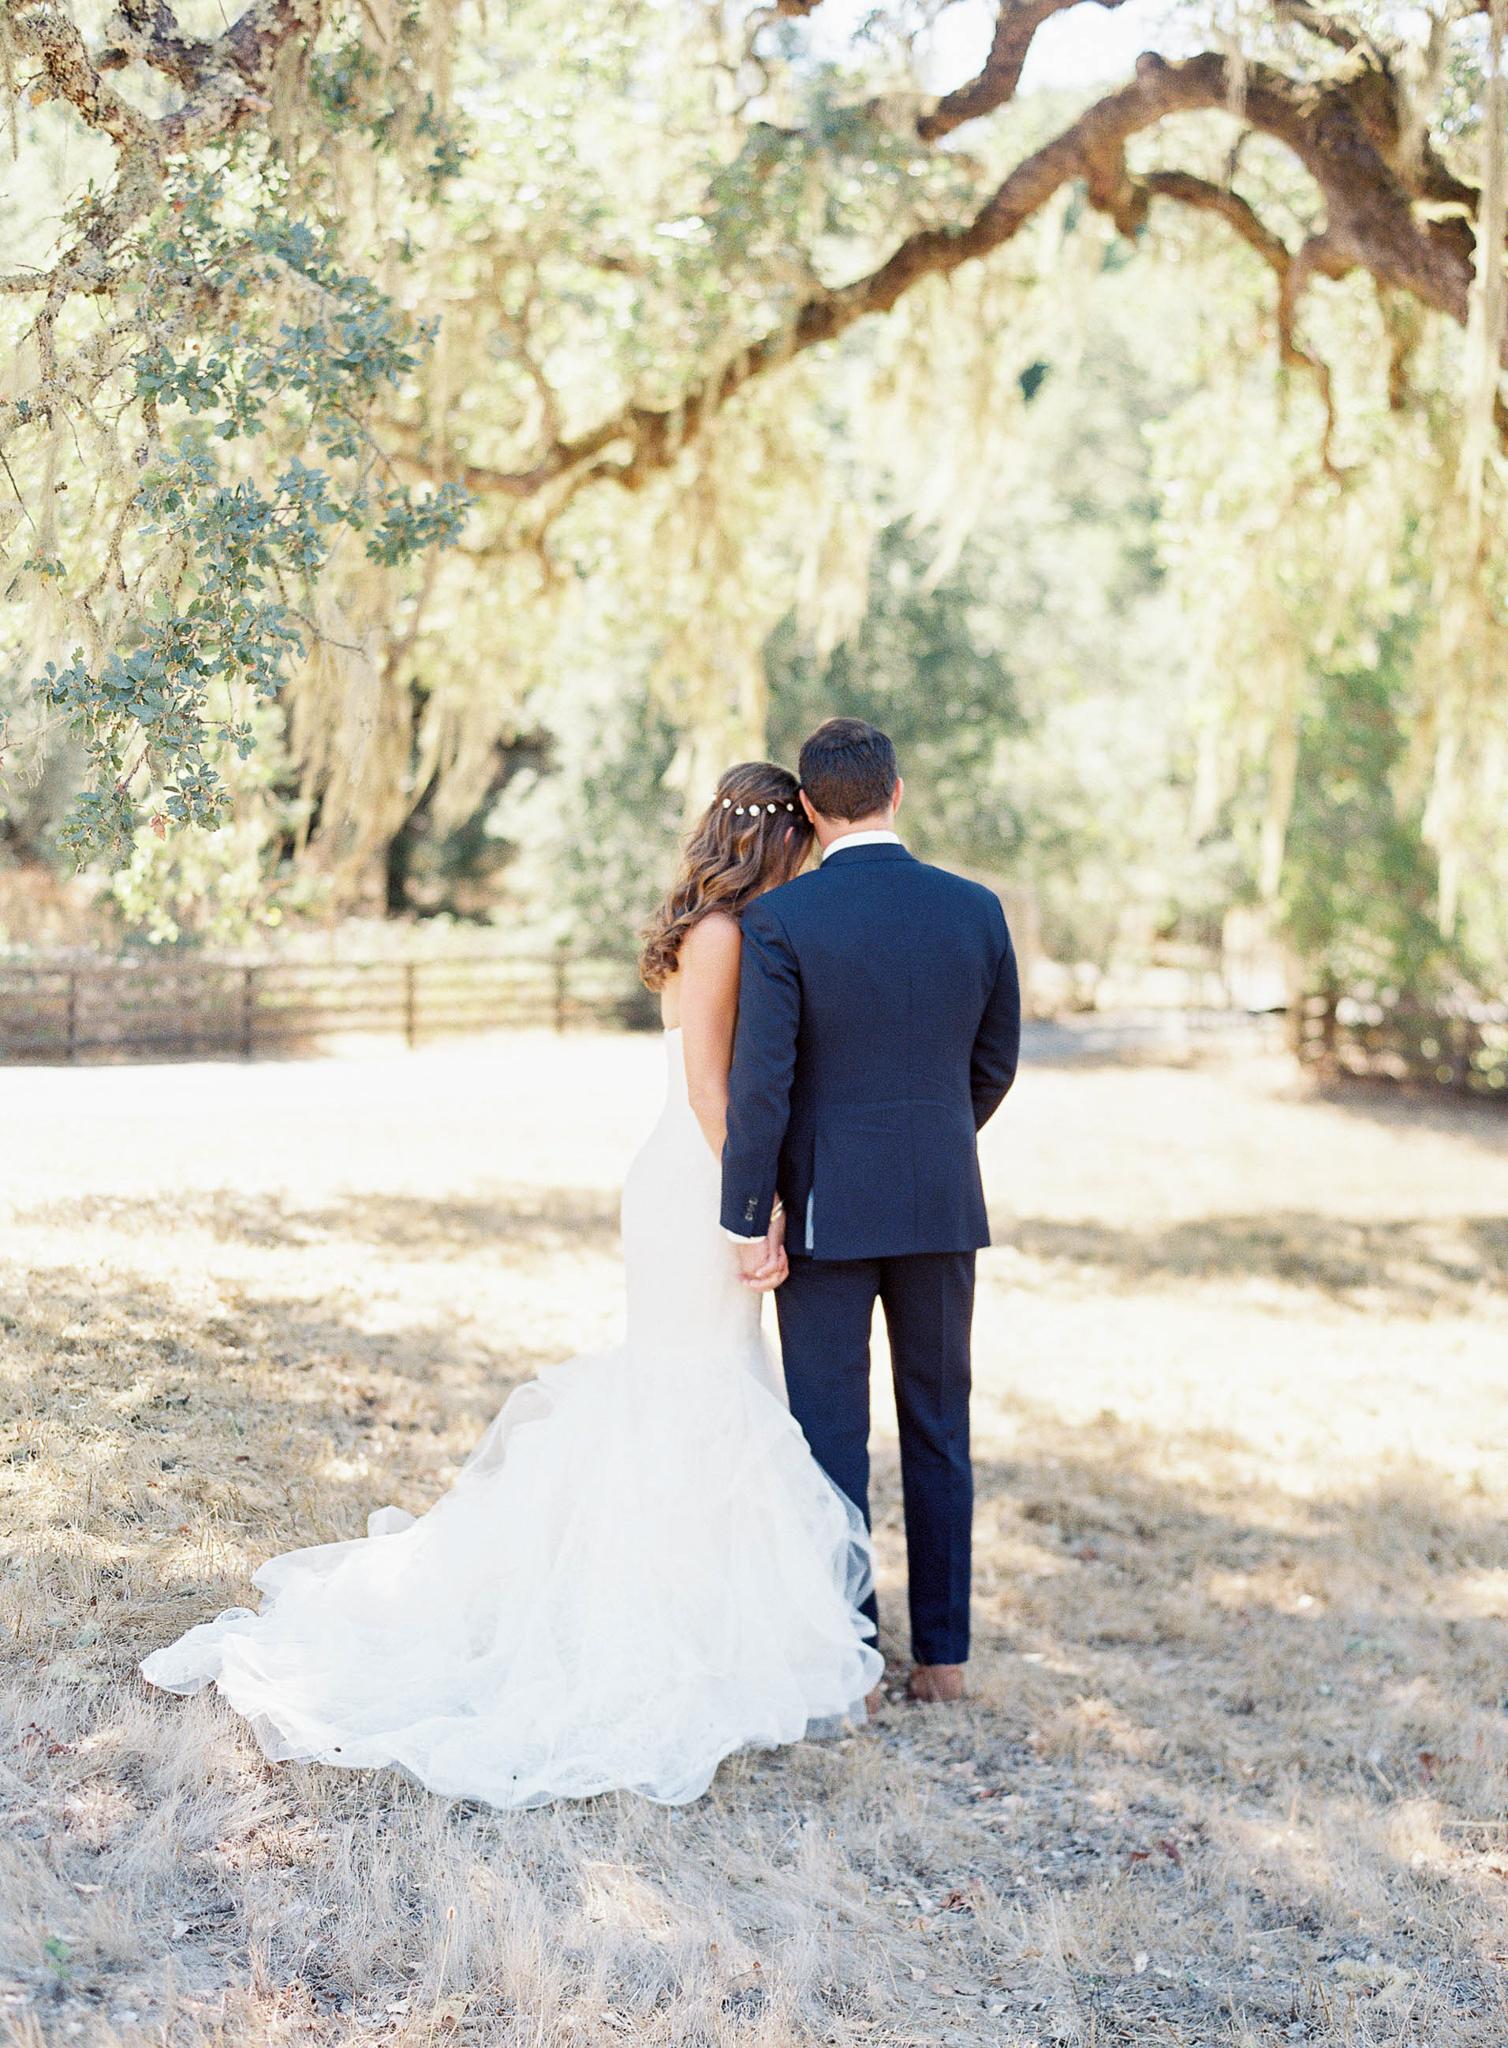 Meghan Mehan Photography - Fine Art Film Wedding Photography - San Francisco   Napa   Sonoma   Big Sur   Chicago   Minneapolis   Milwaukee   Lake Geneva   Door County   Wisconsin 047.jpg